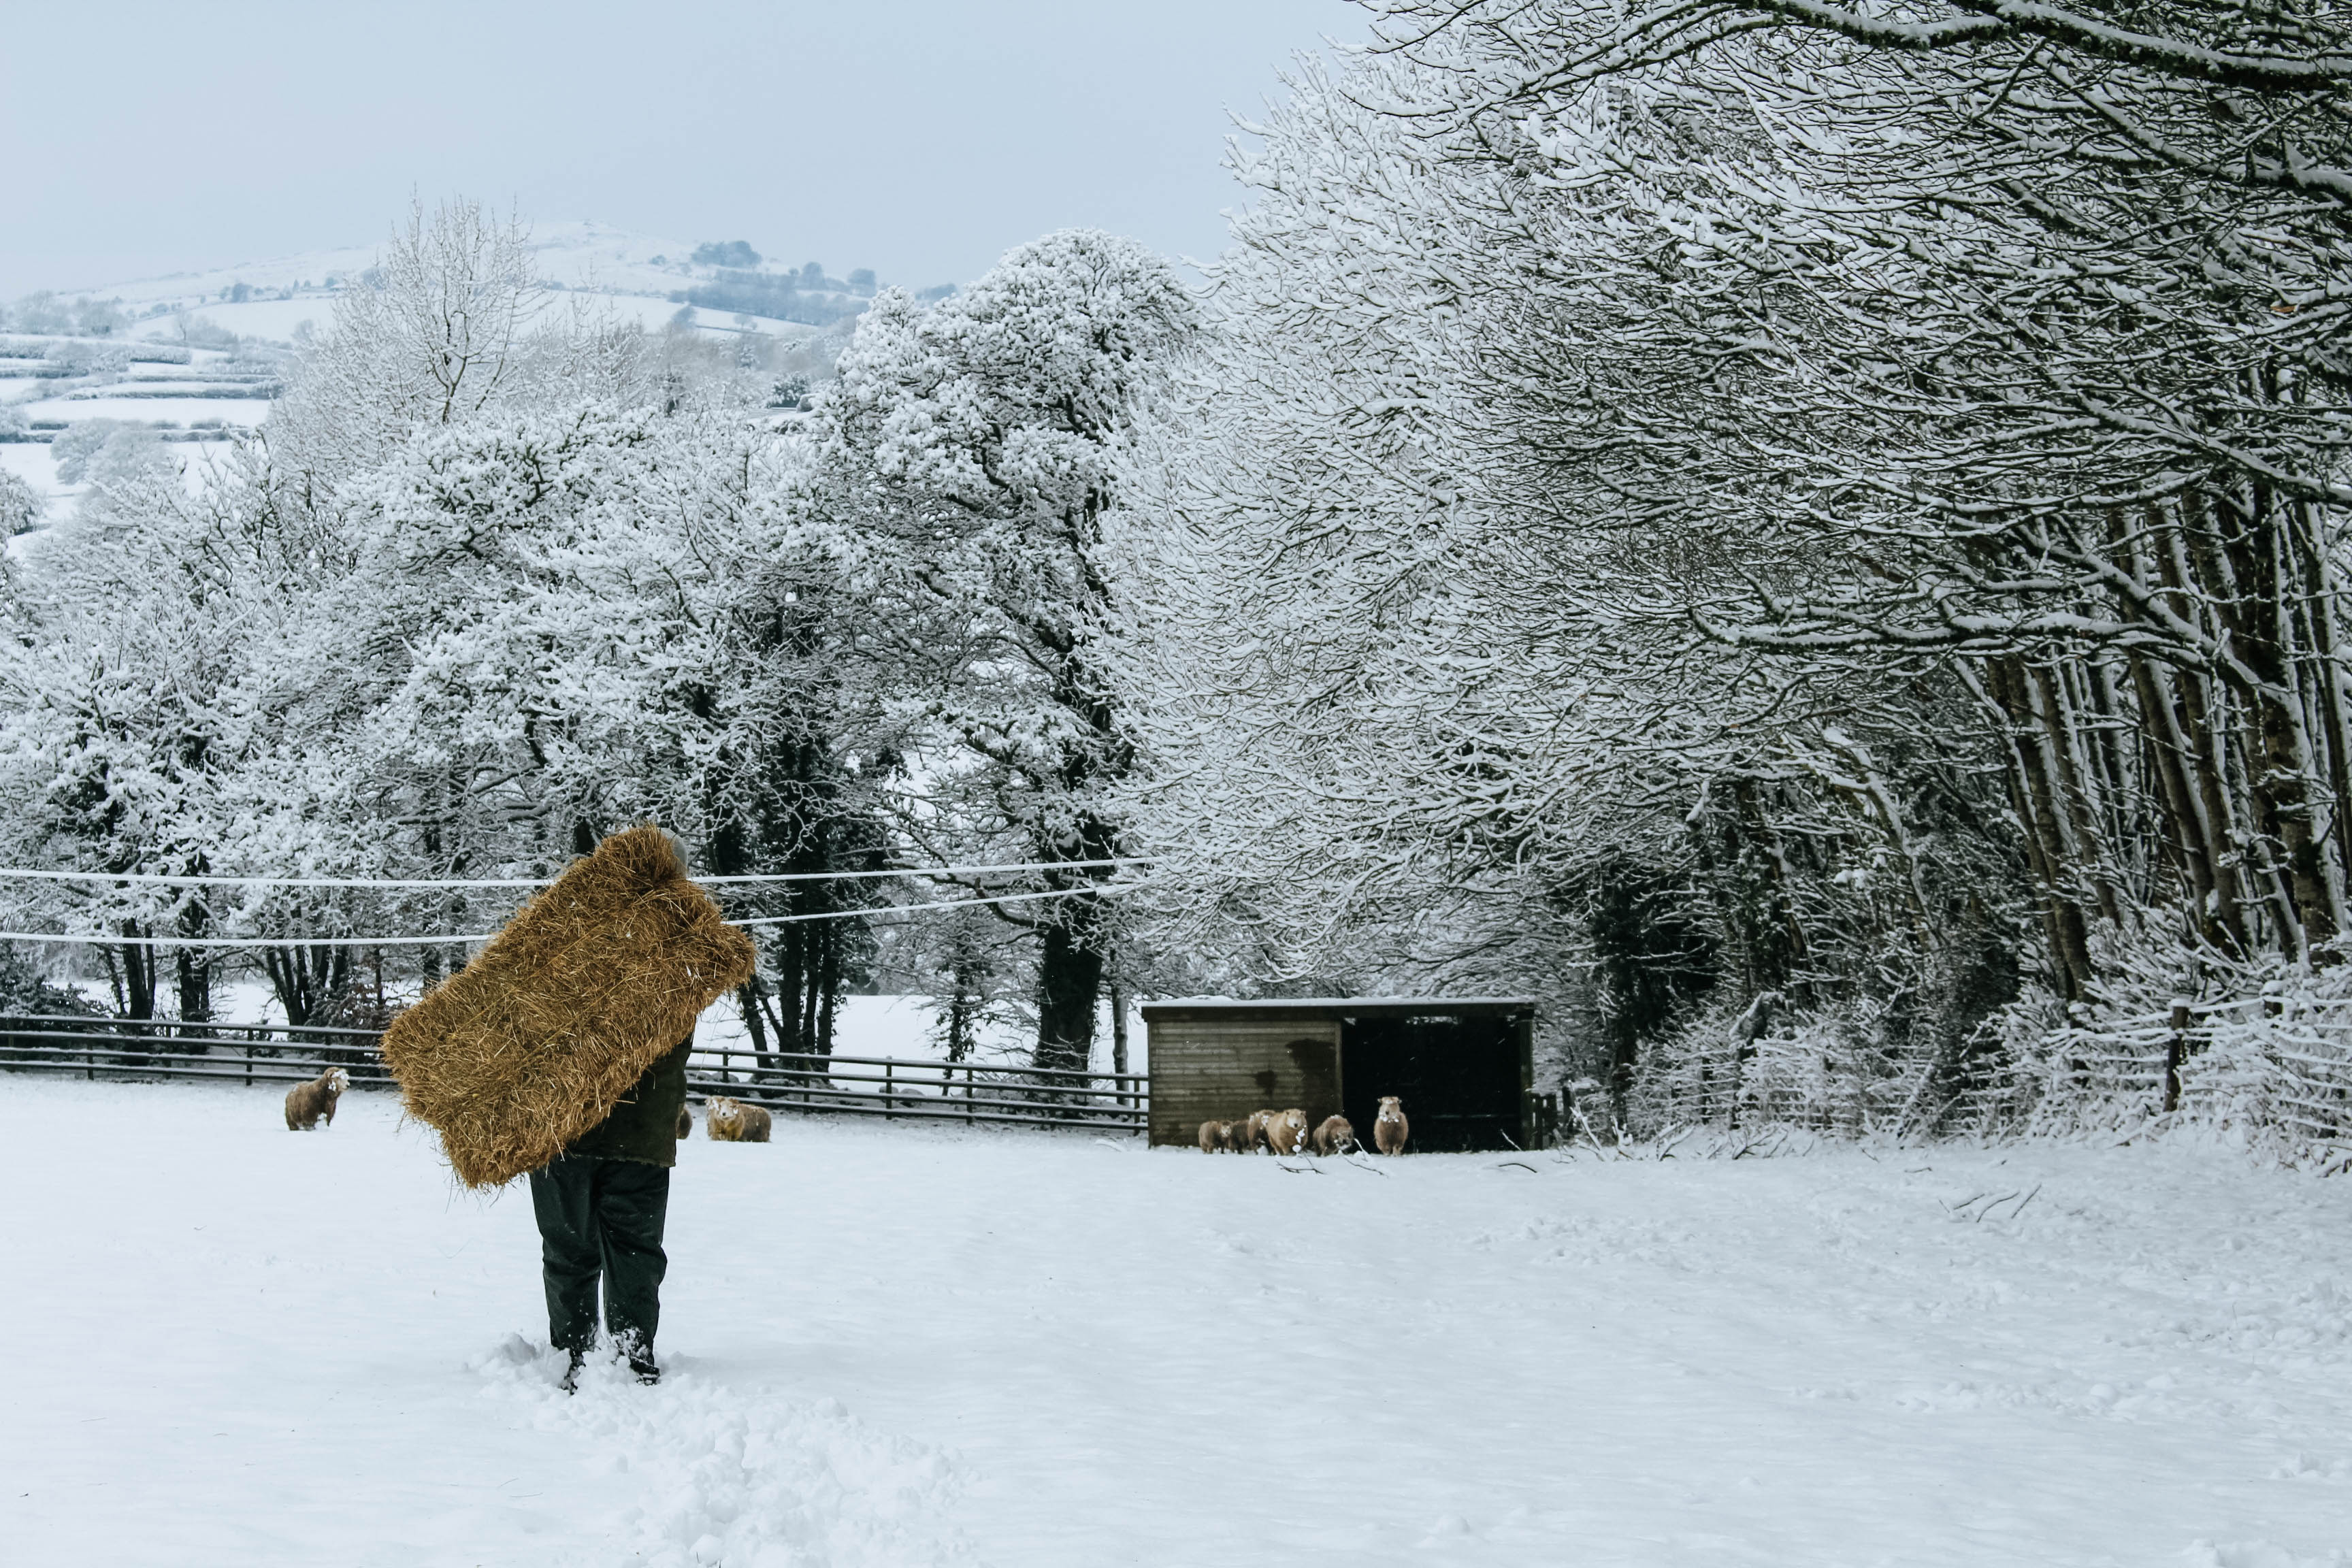 Feeding the sheep at Everley